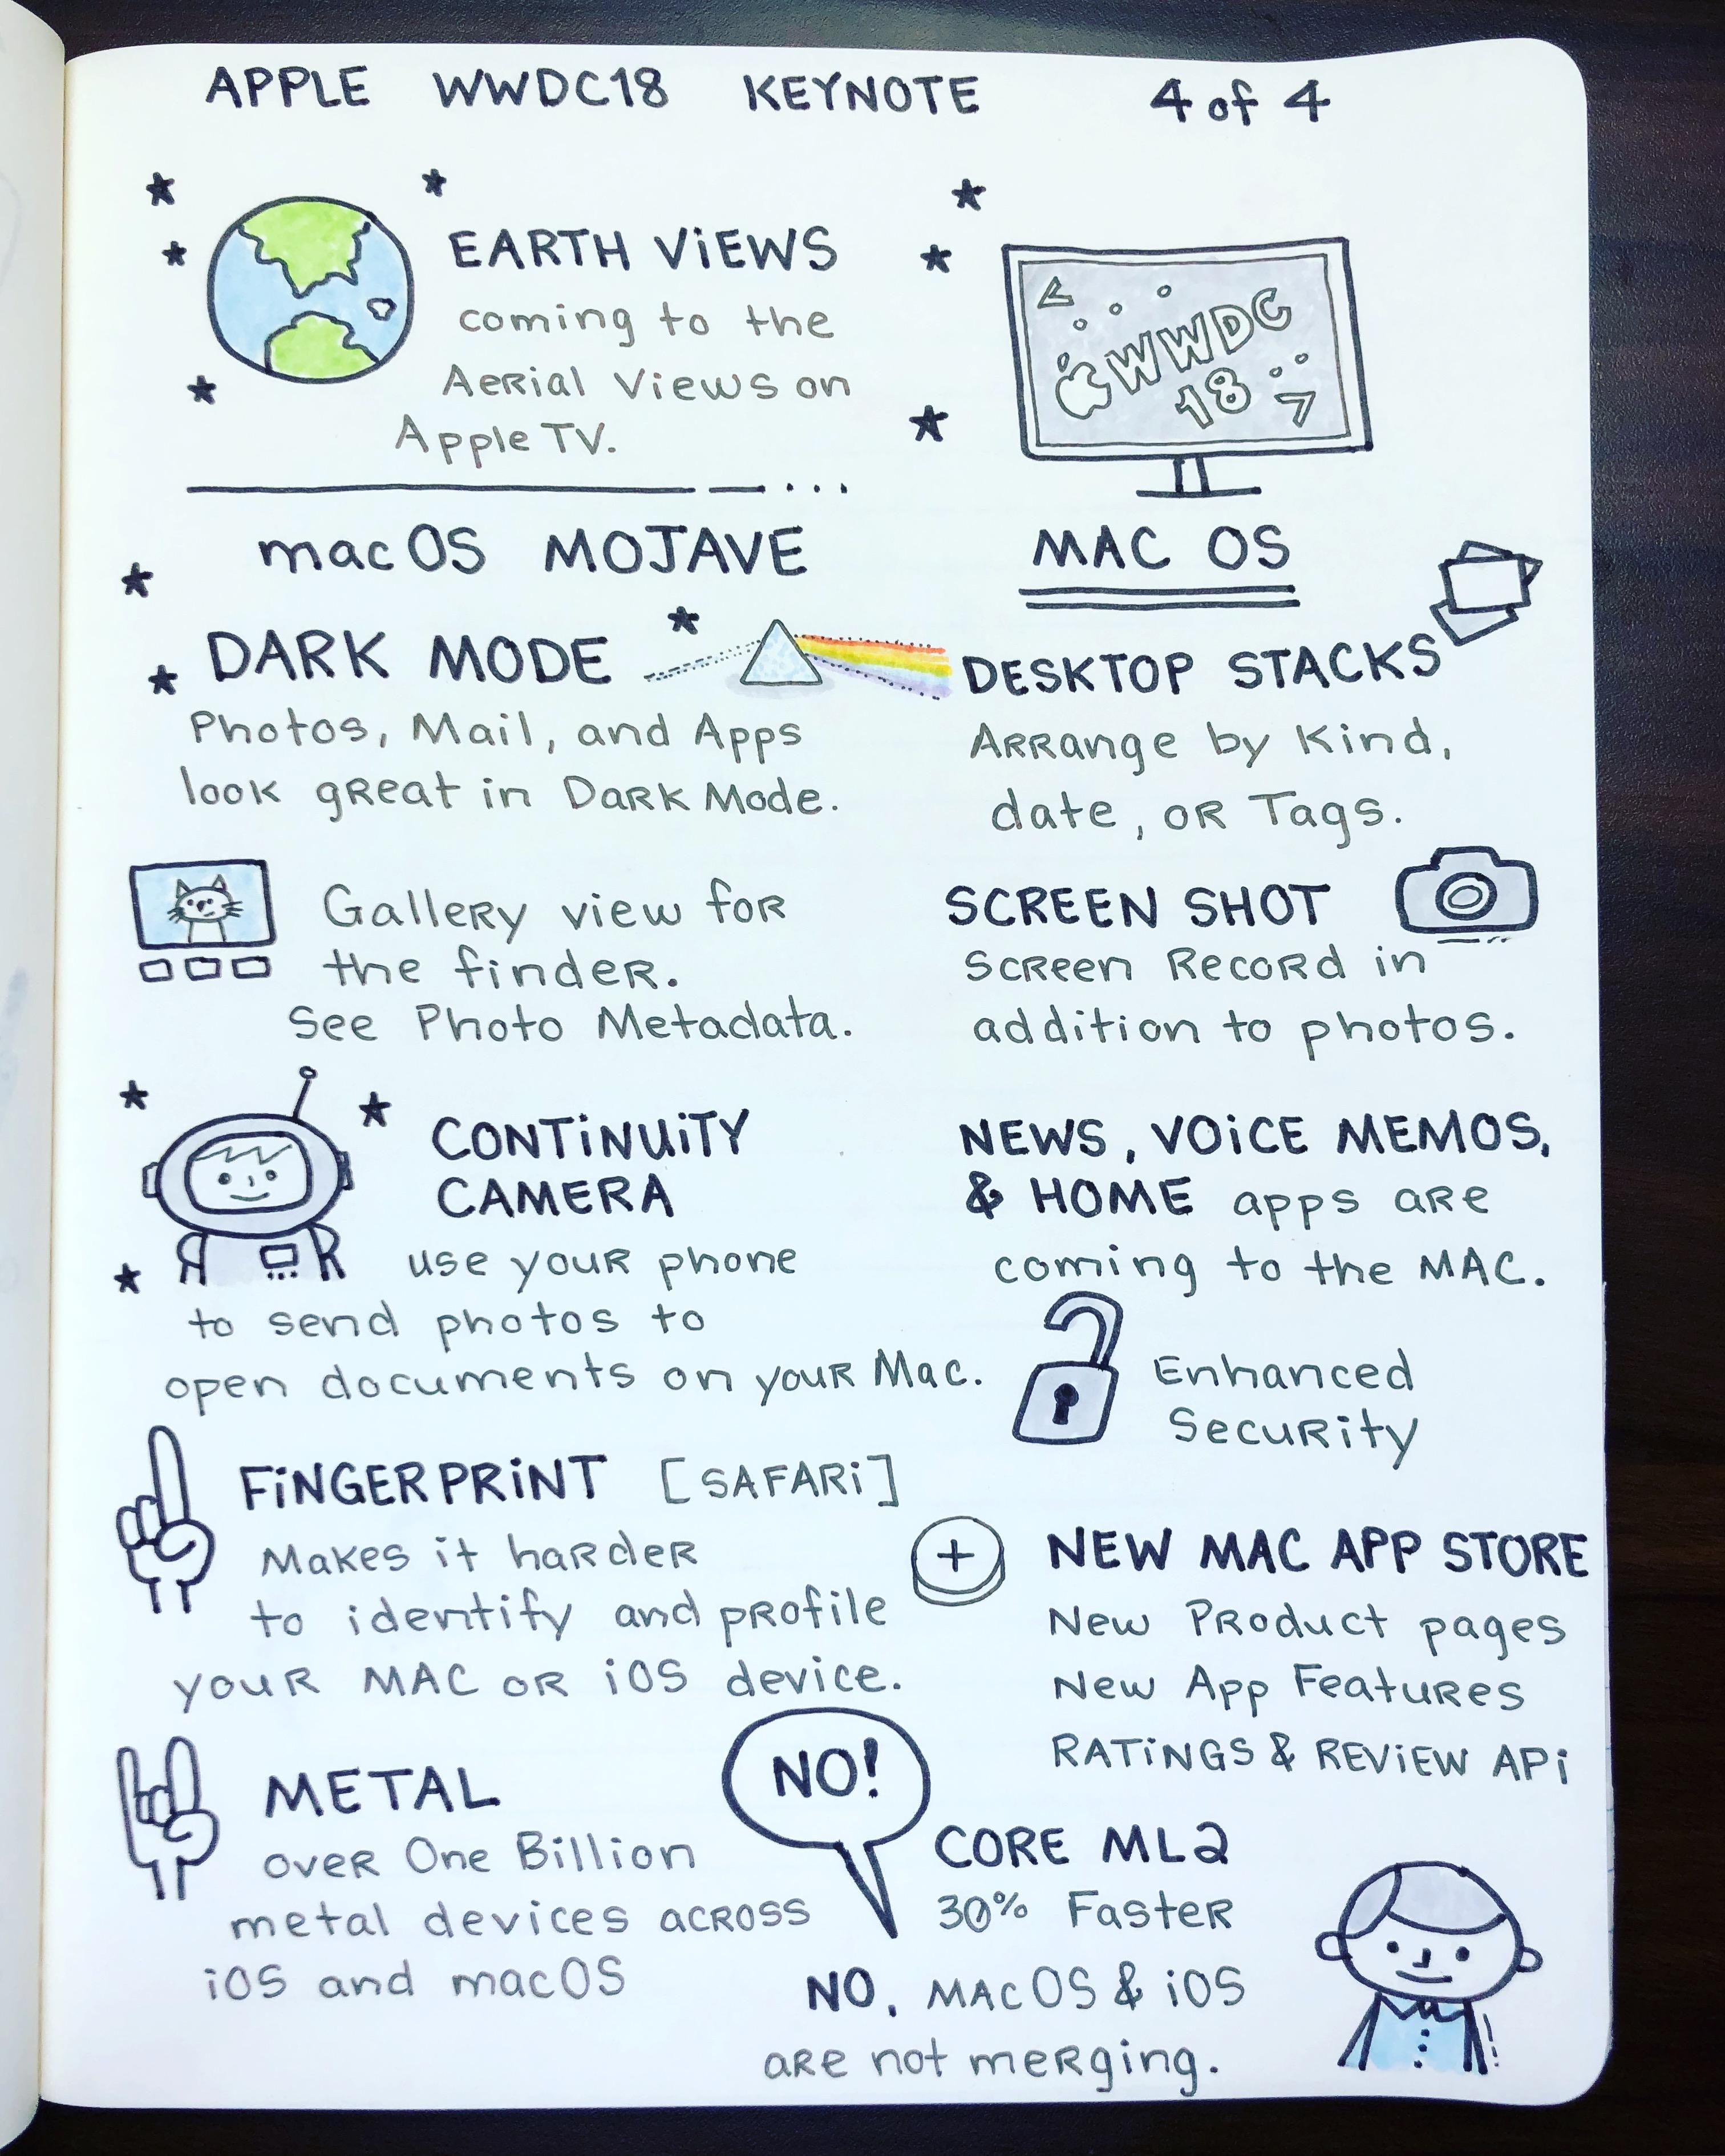 Apple WWDC 2018 keynote in sketchnotes, Part 4 of 4.